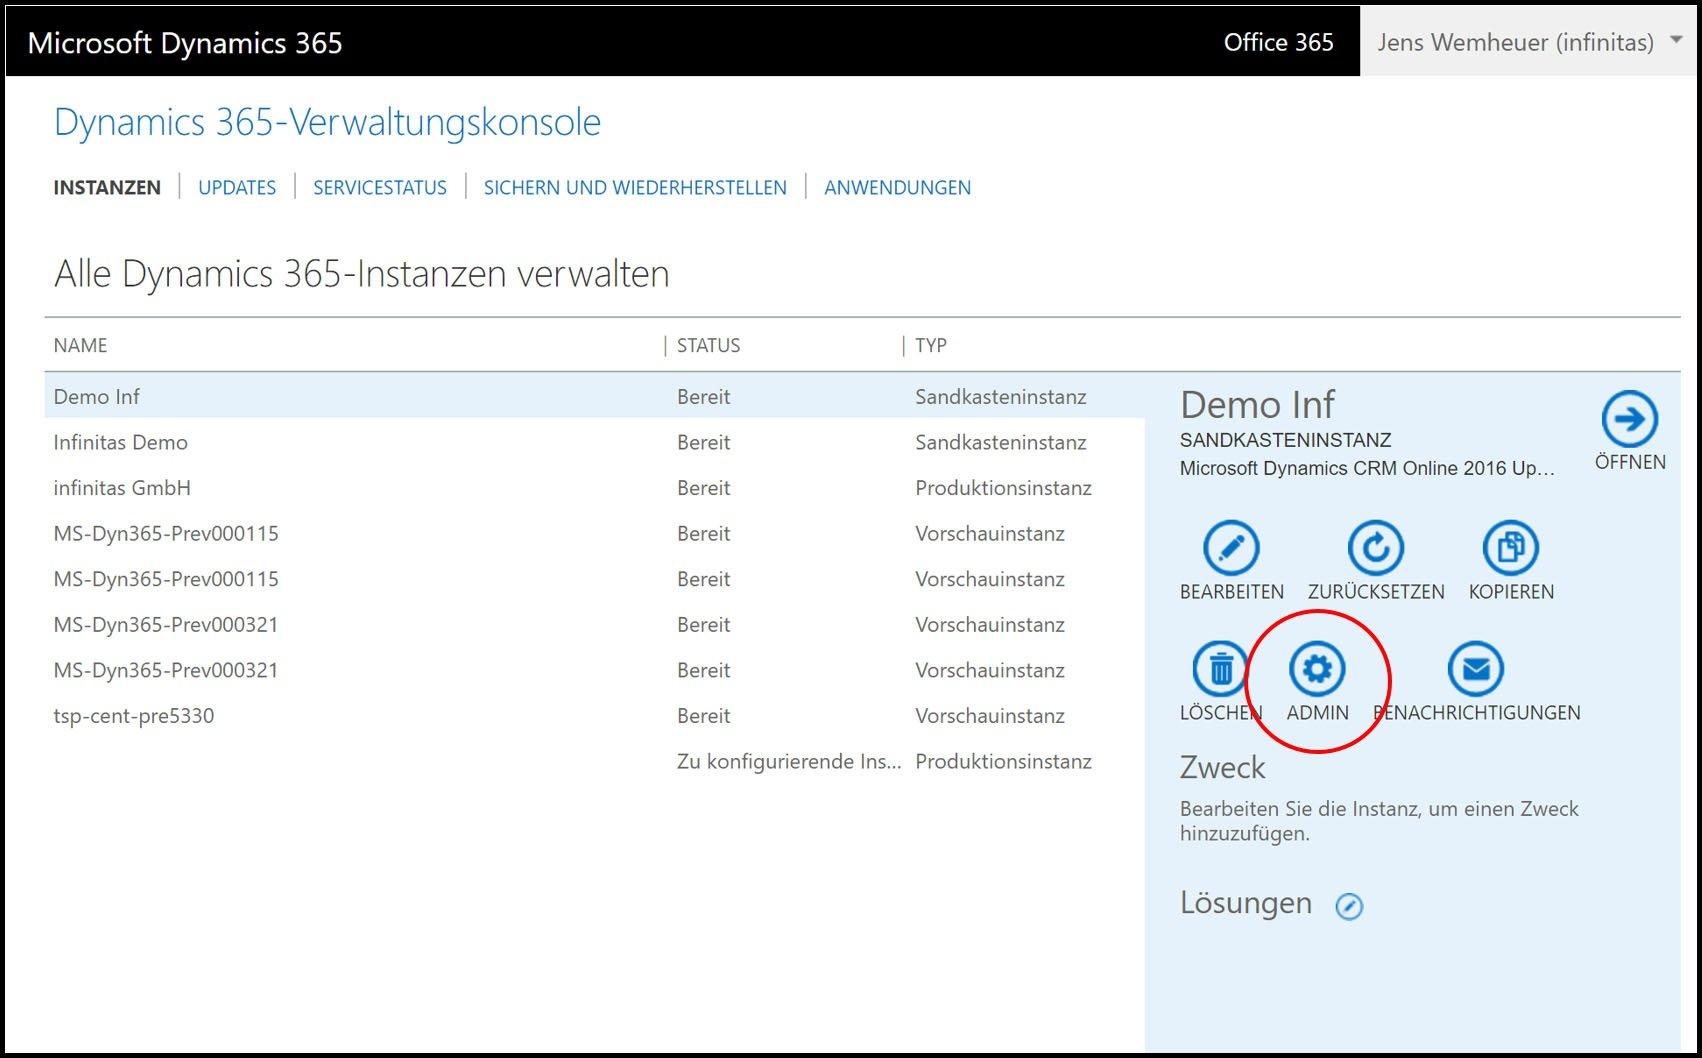 Microsoft Dynamics 365 Verwaltungskonsole